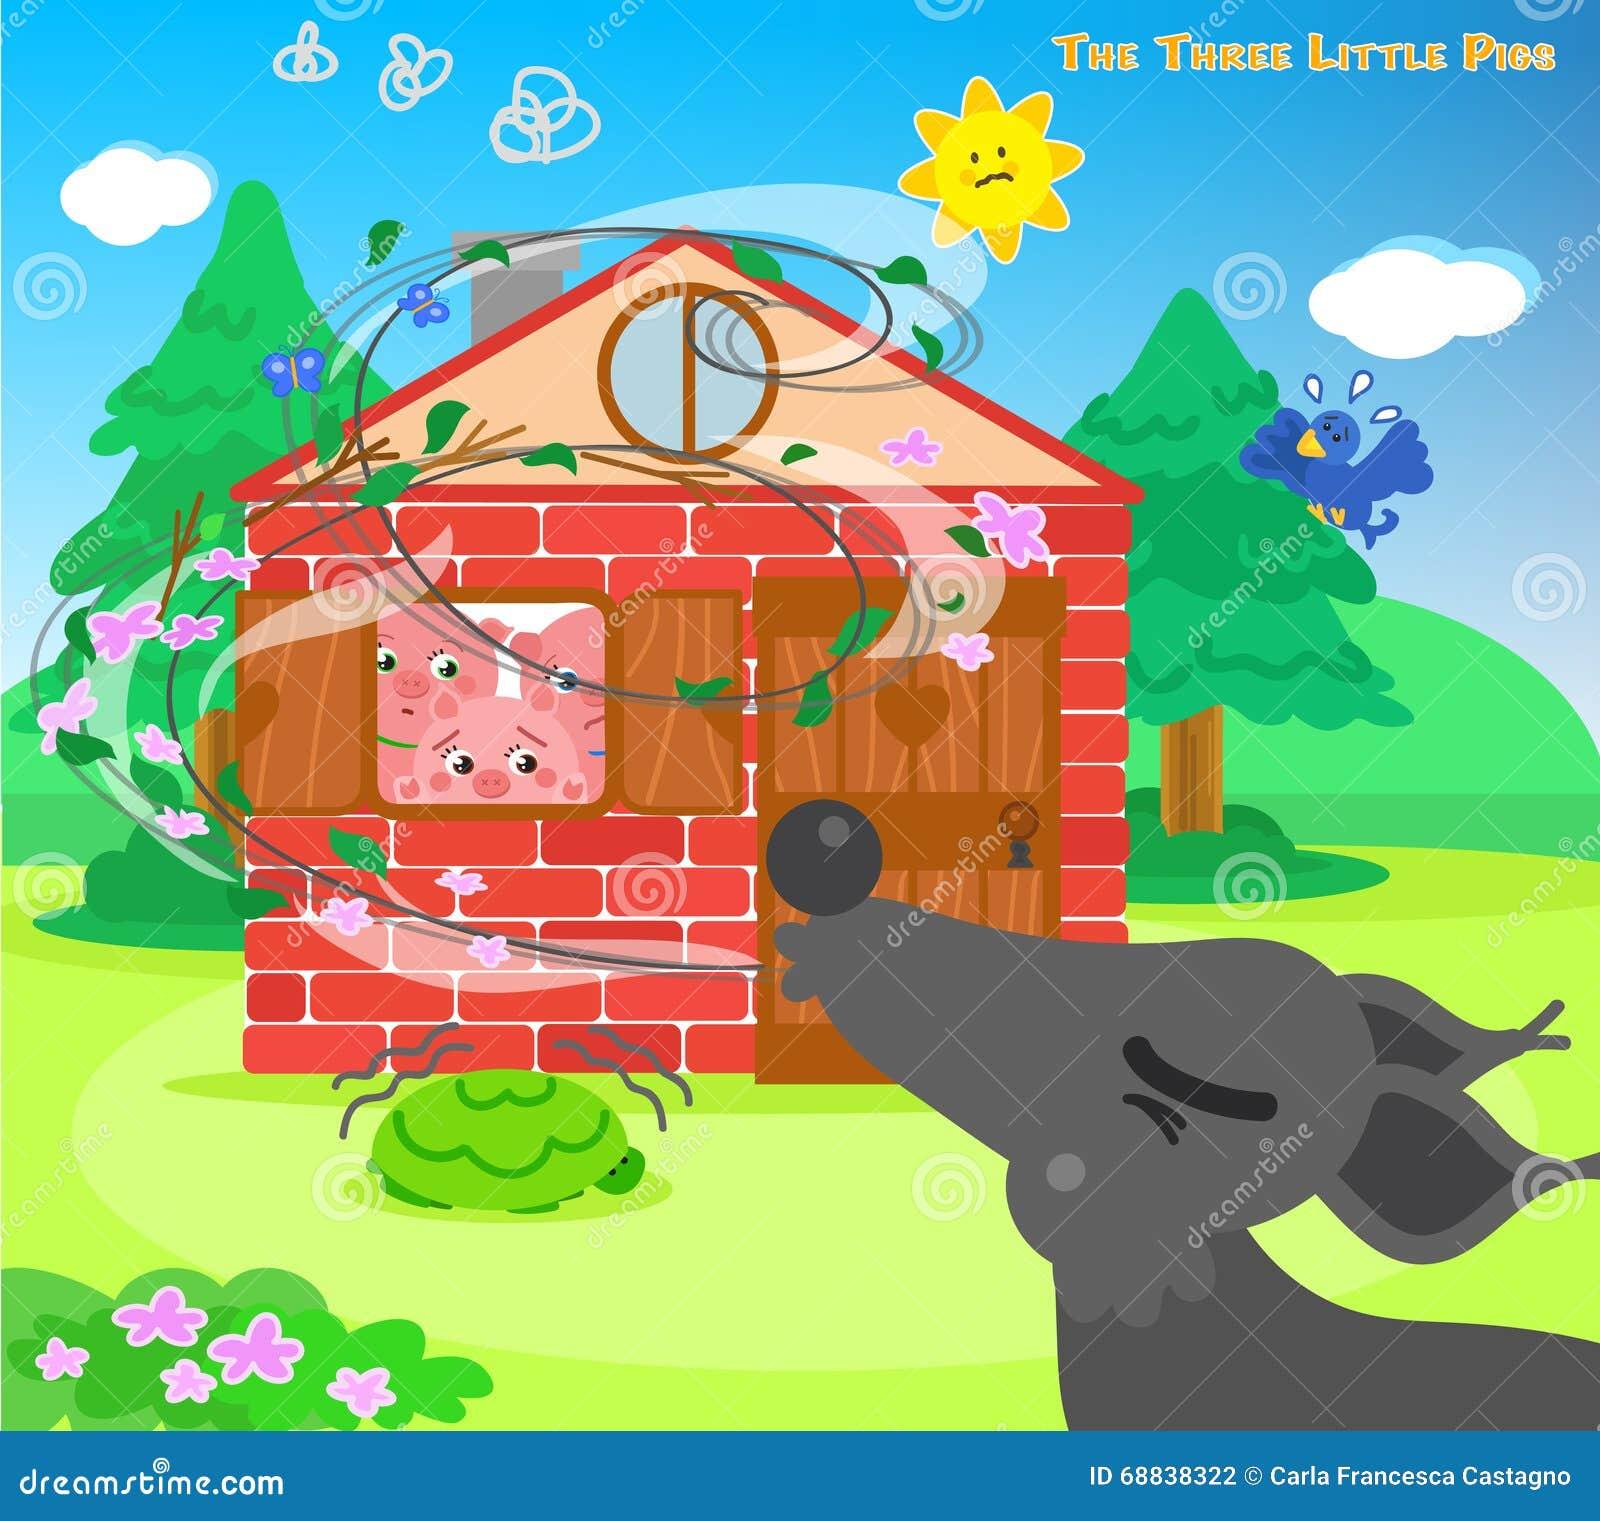 Brick house clipart three little pigs